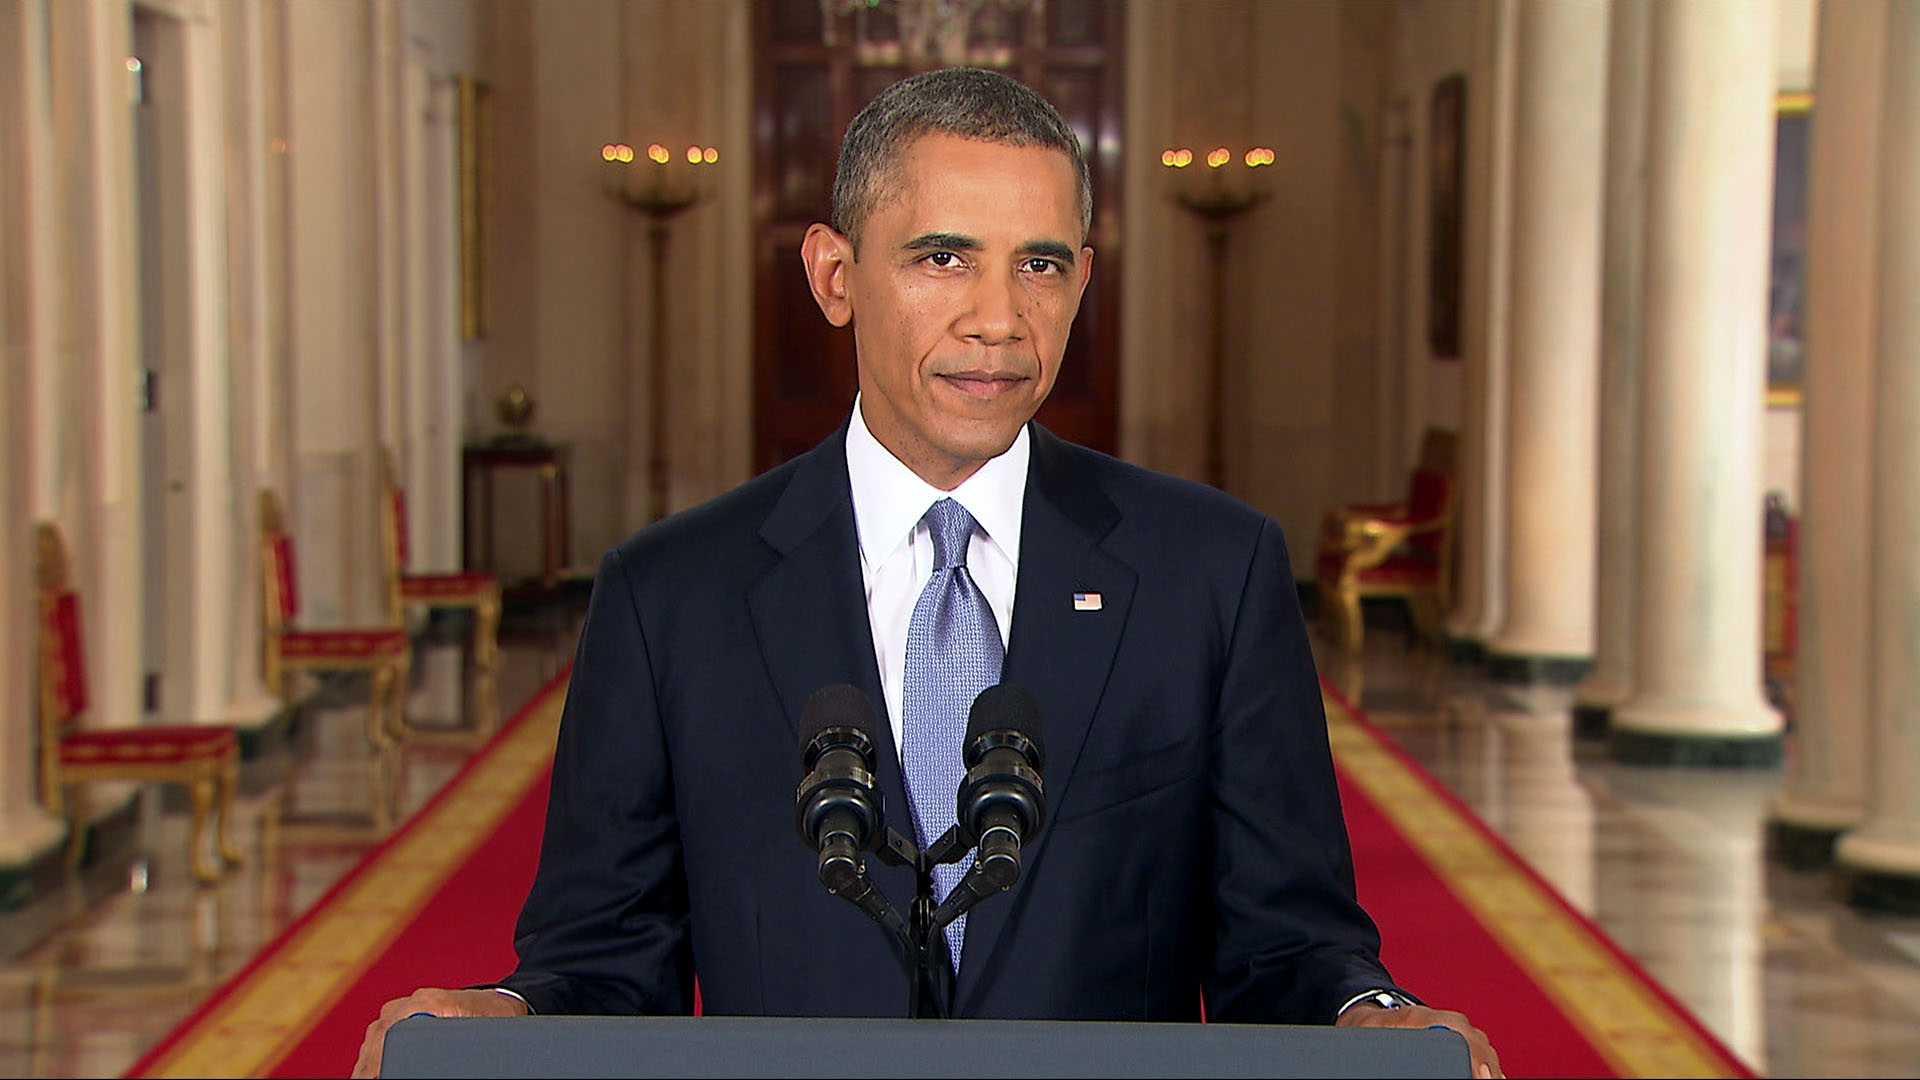 Image result for obama speech